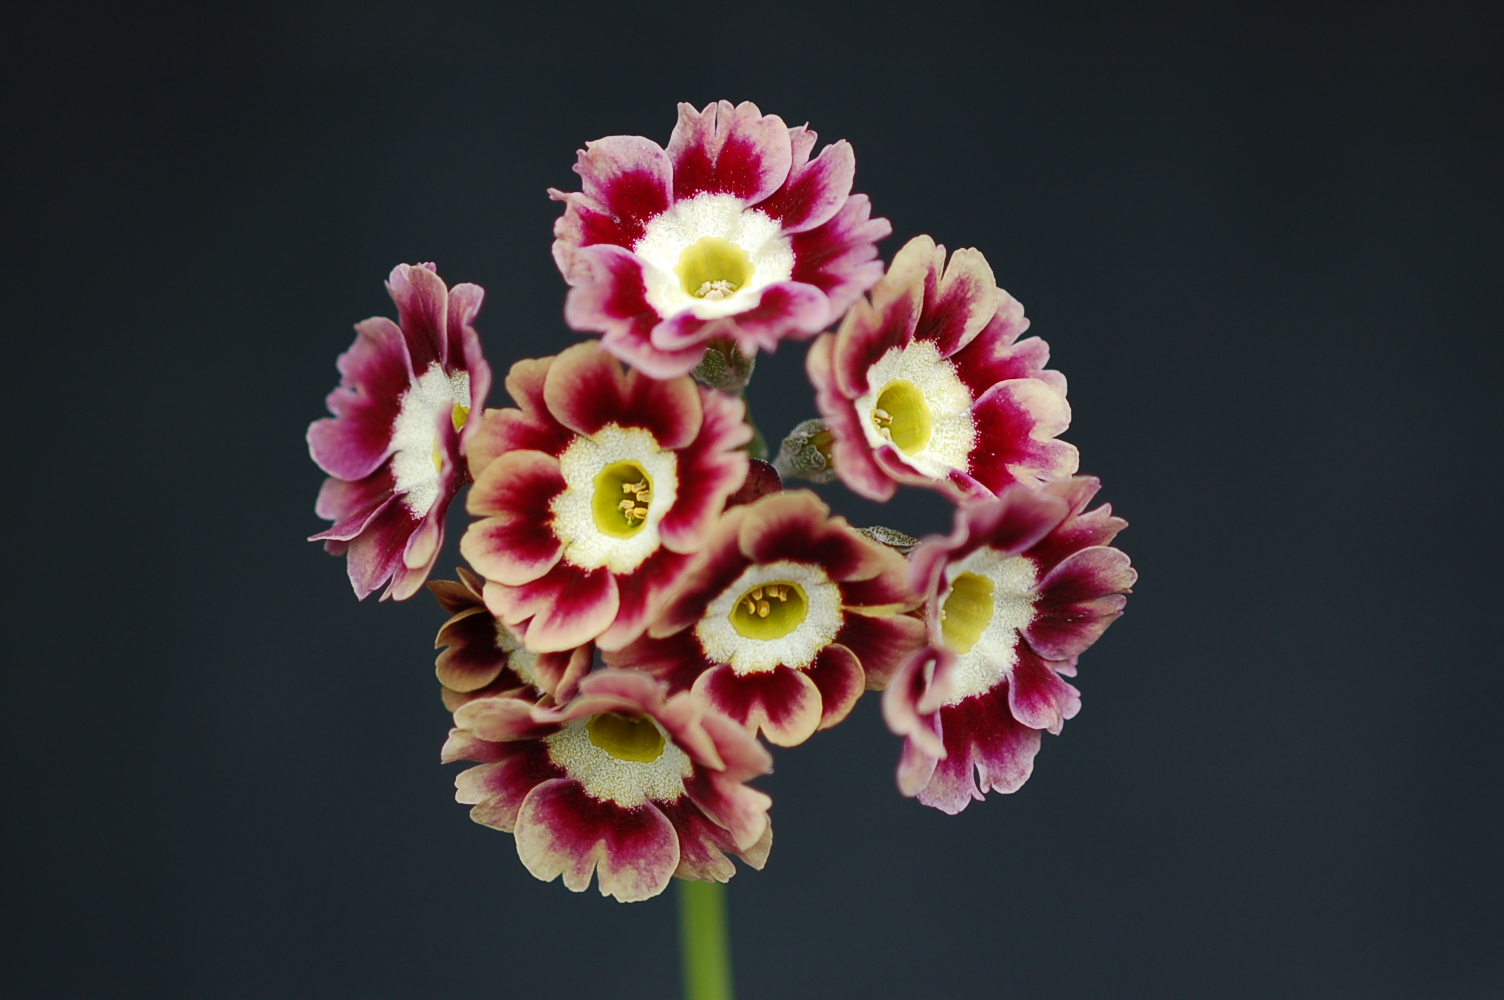 Primula x pubescens Border Auricula Image